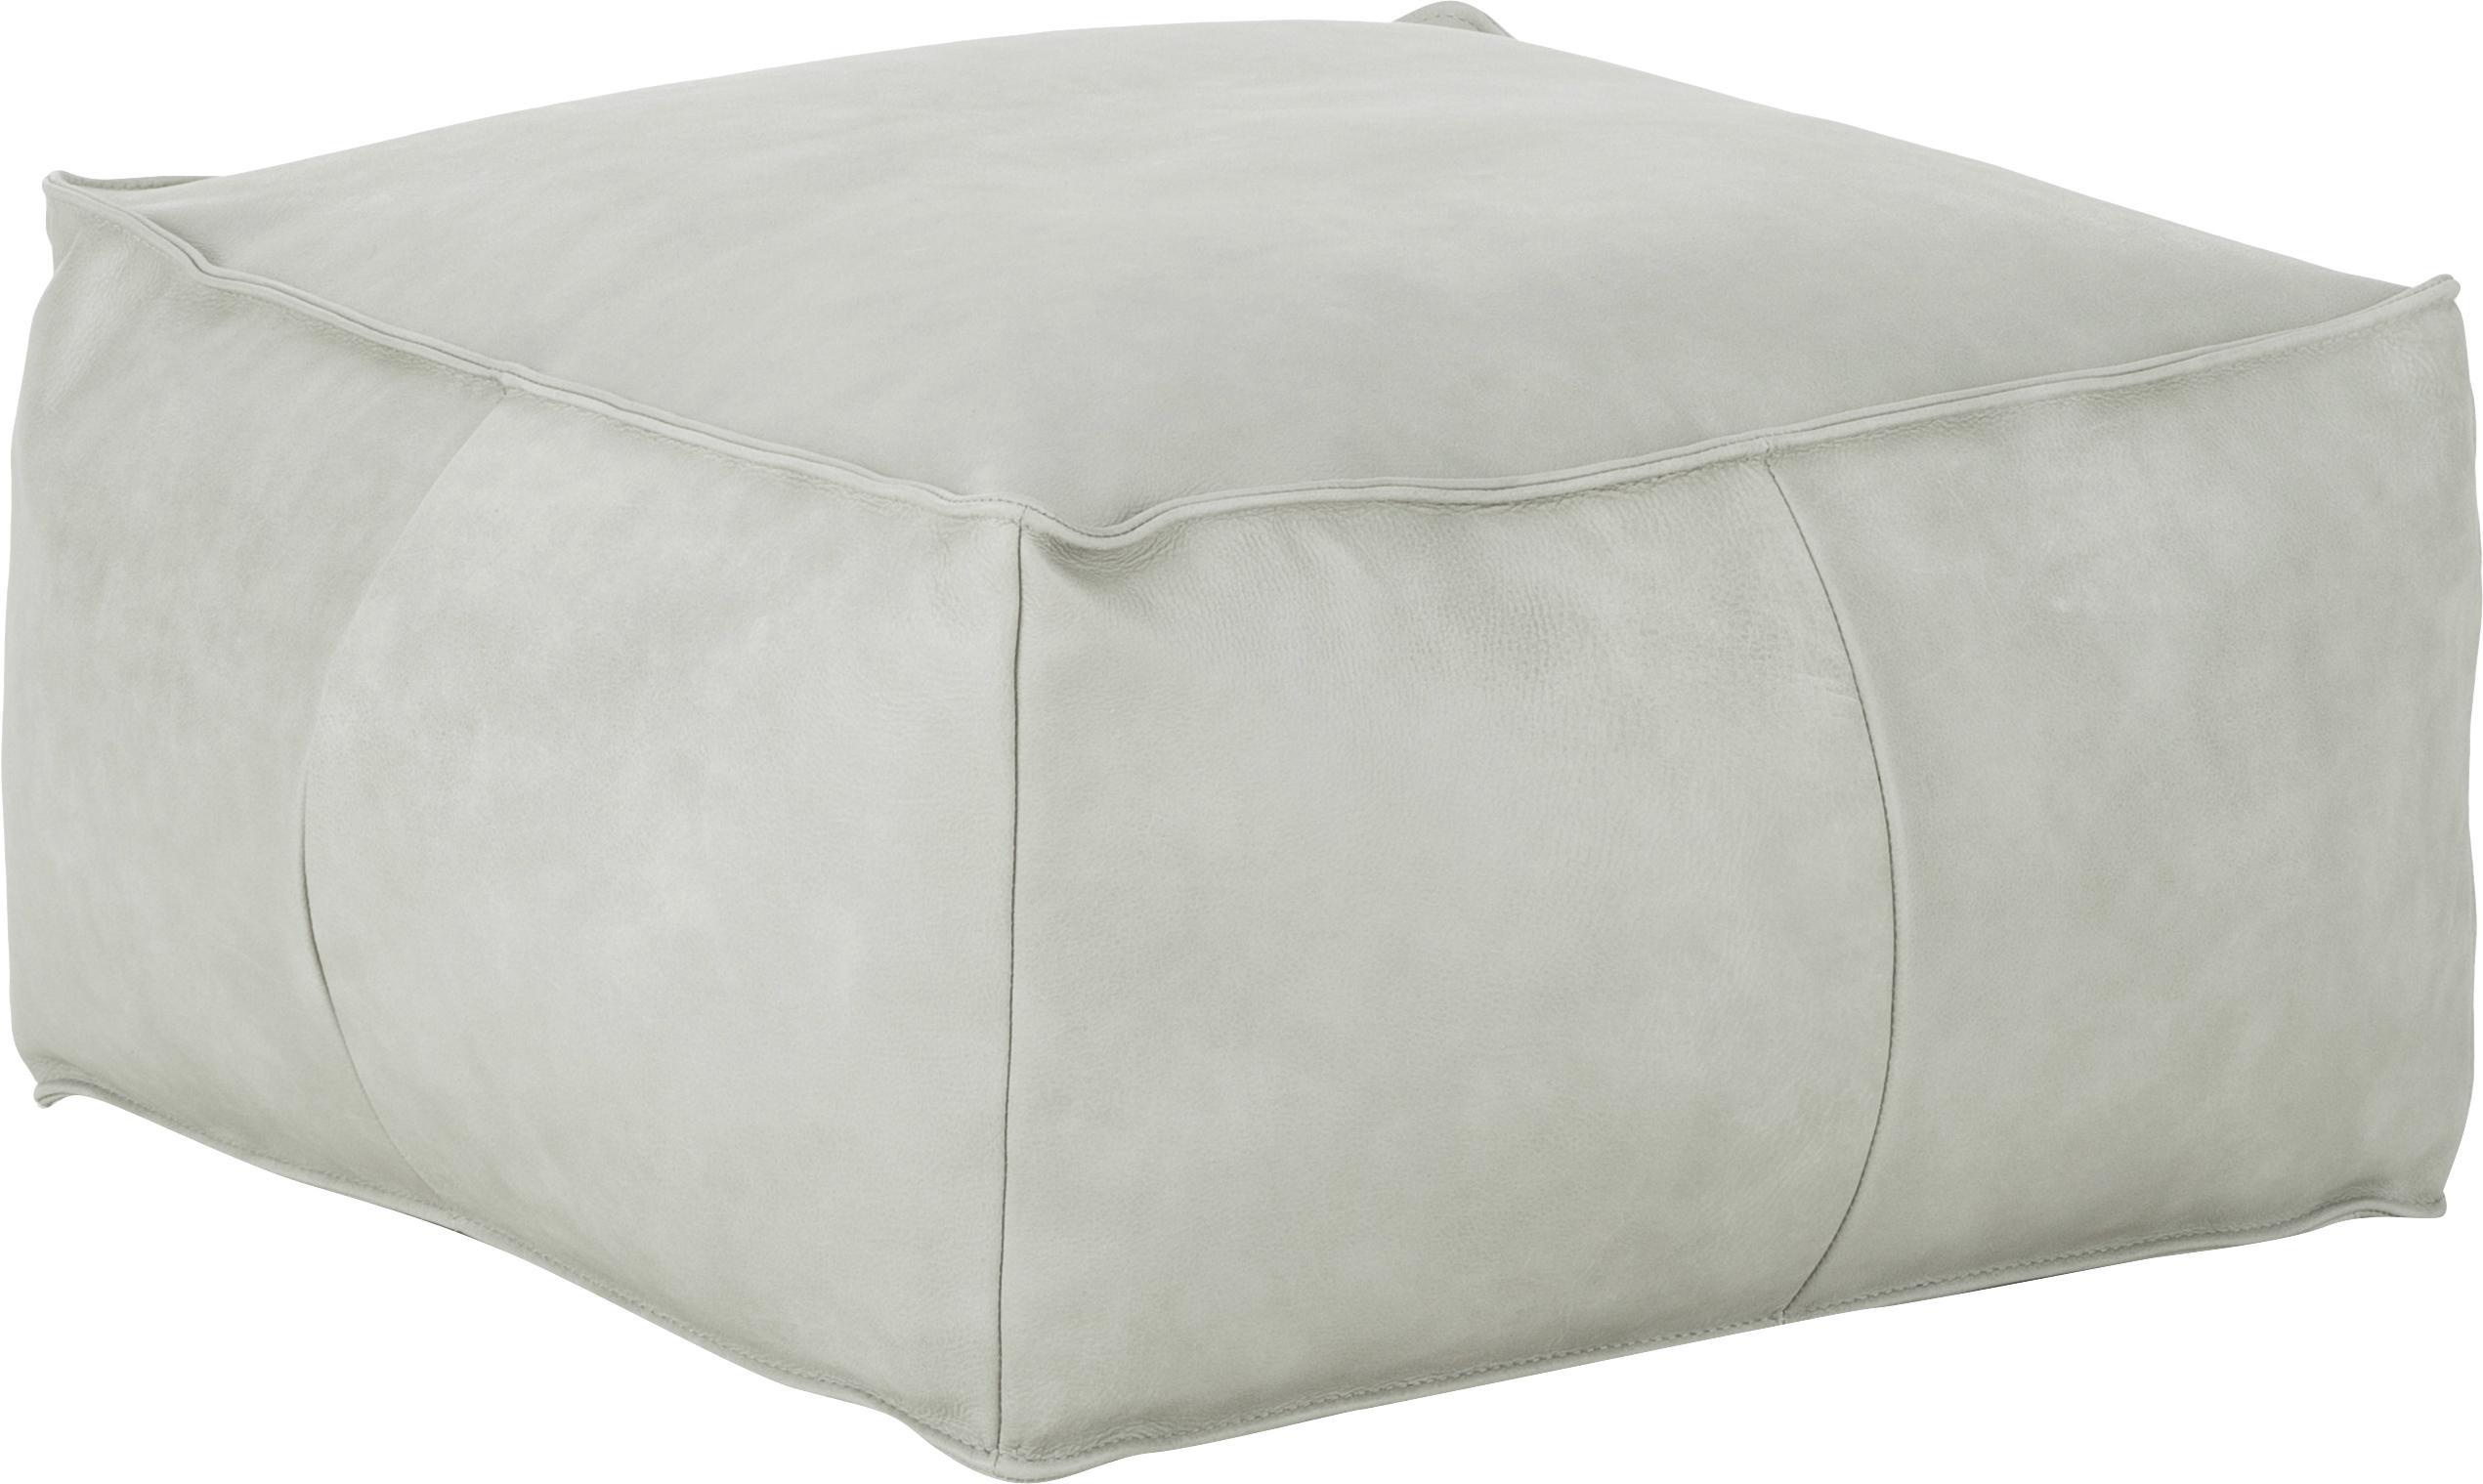 Cuscino da pavimento in pelle Porthos, Rivestimento: 100% pelle anilina, Grigio chiaro, Larg. 80 x Alt. 33 cm